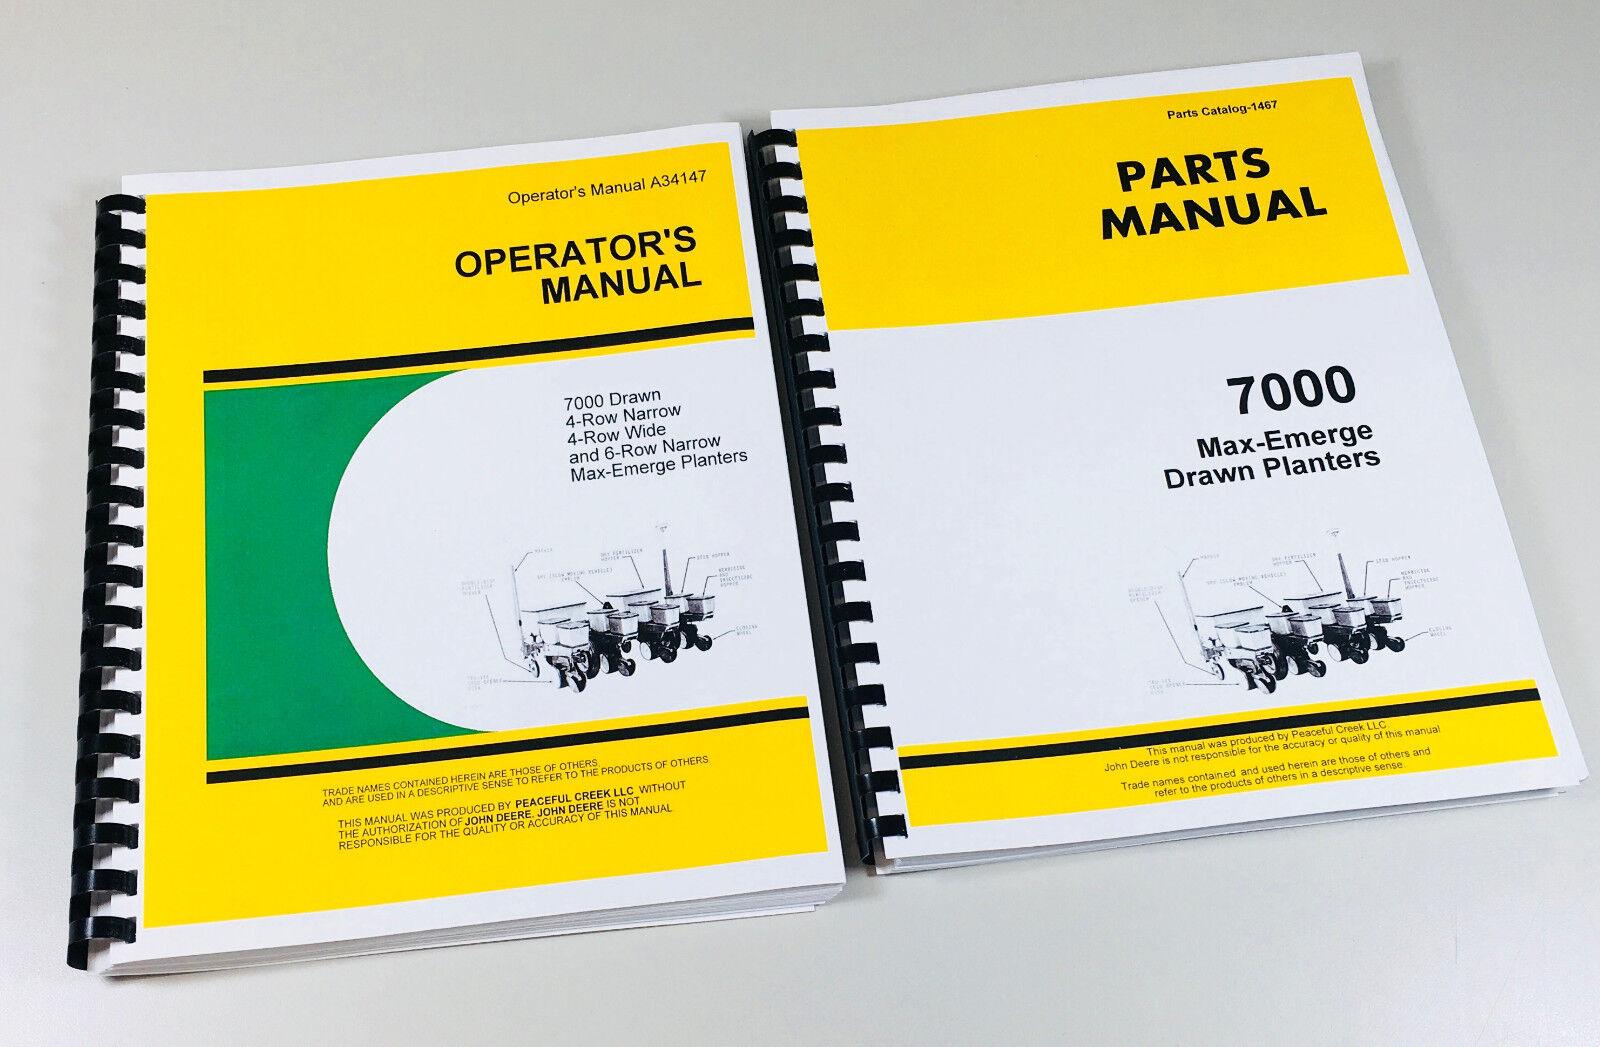 Operators Parts Manual Set John Deere 7000 Drawn Max Emerge Planter